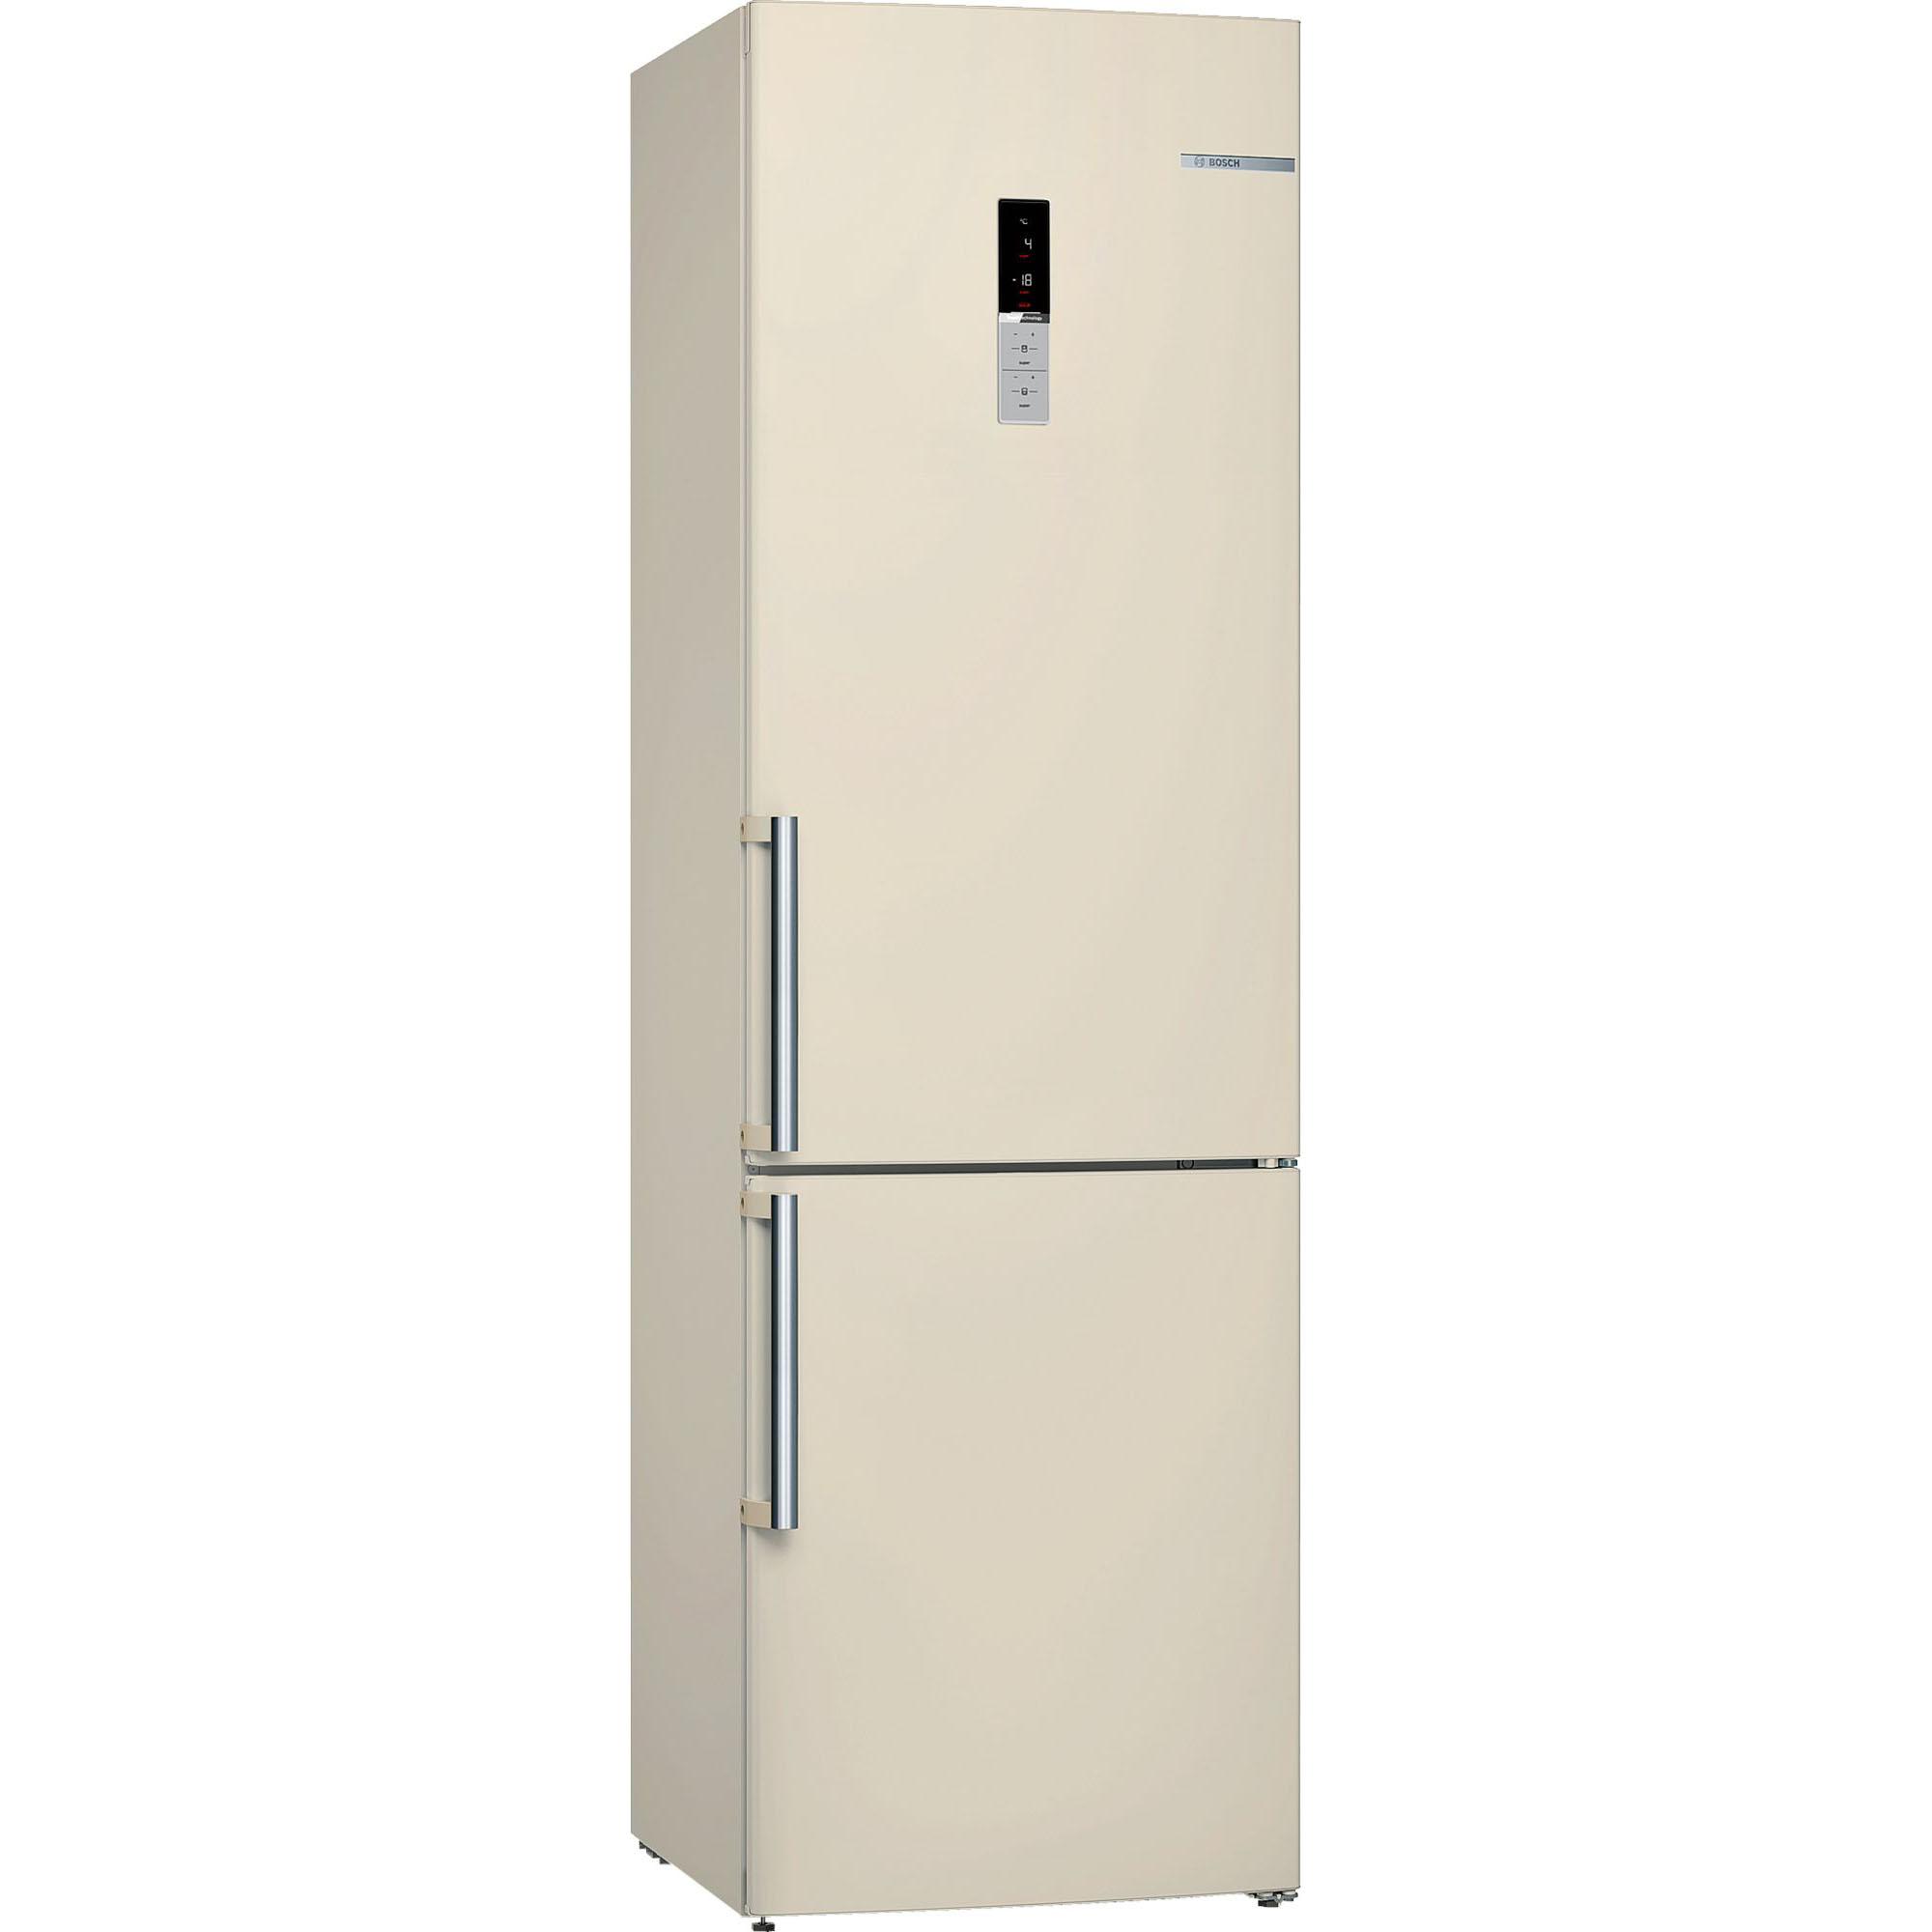 Холодильник Bosch KGE39XK2OR холодильник bosch kgn39xg34r двухкамерный золотистый